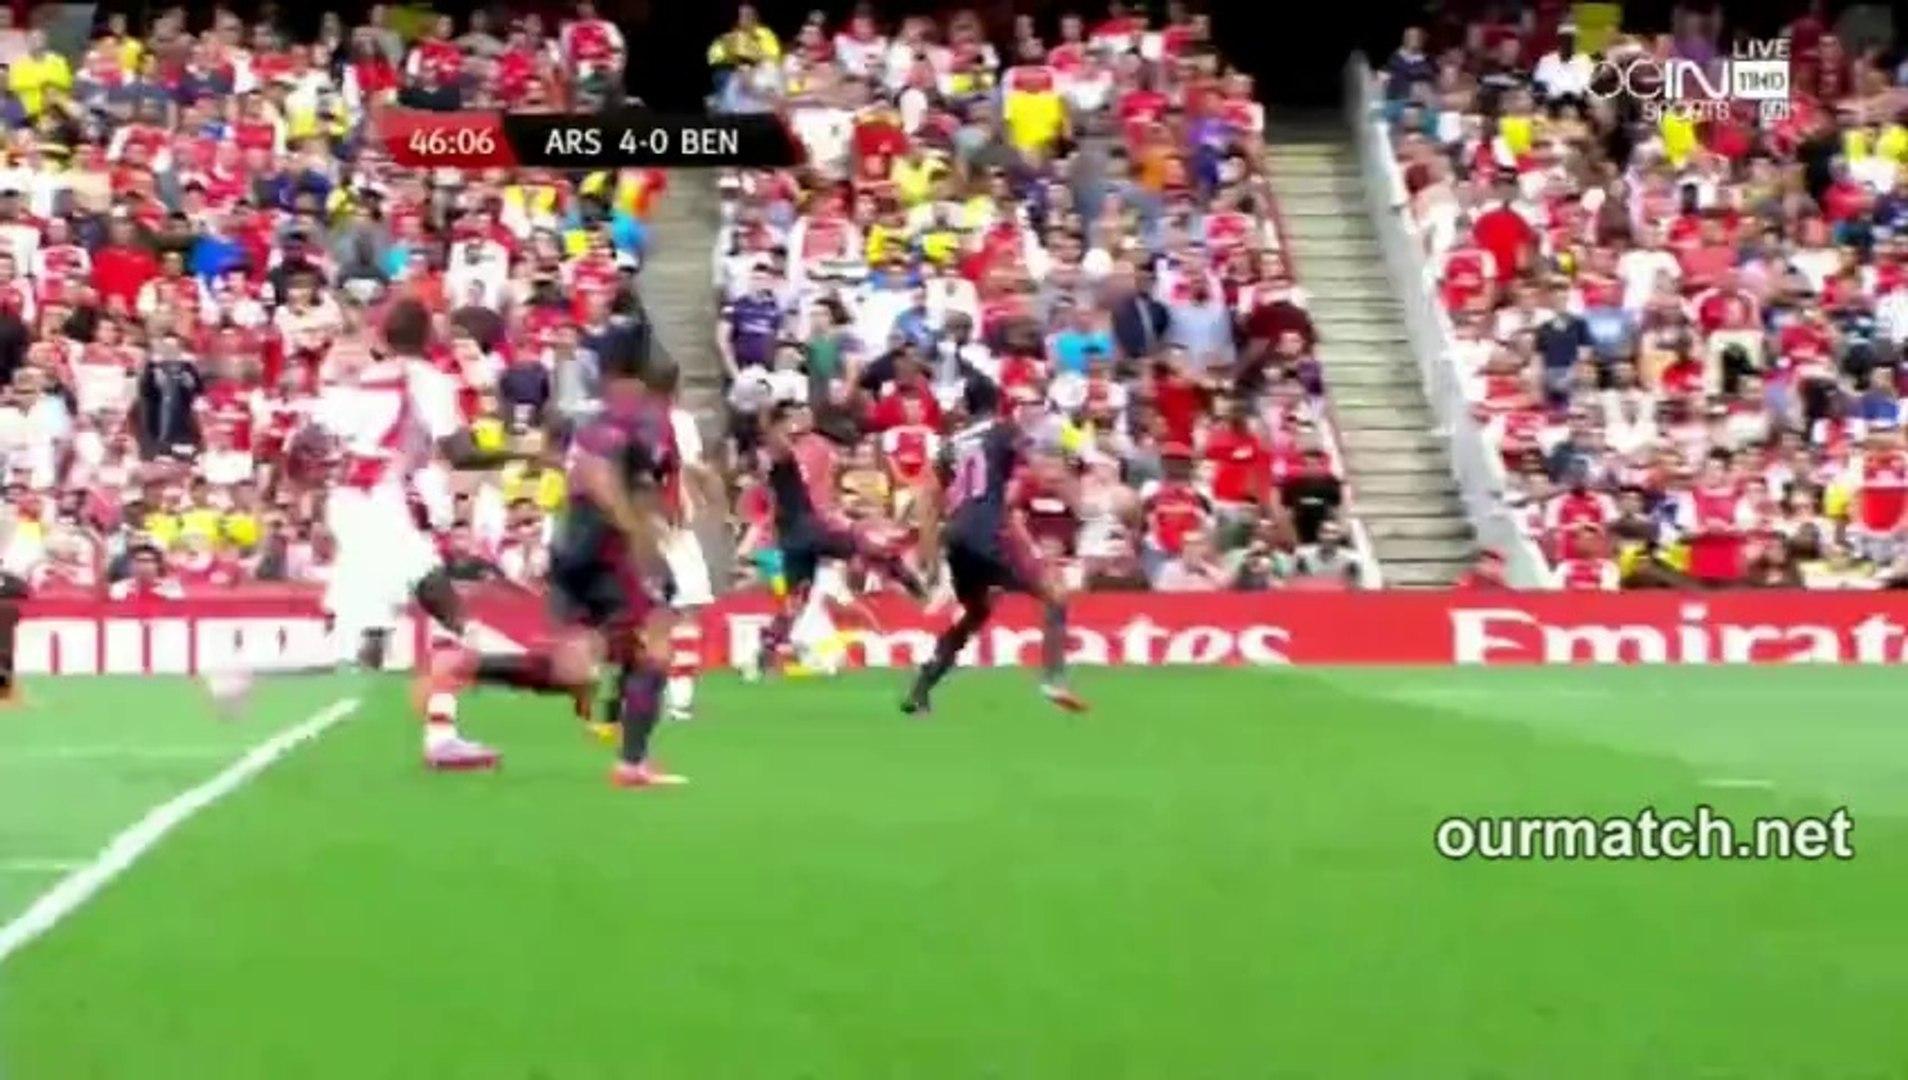 Arsenal 4-0 Benfica (Sanogo Goal) ourmatch.net